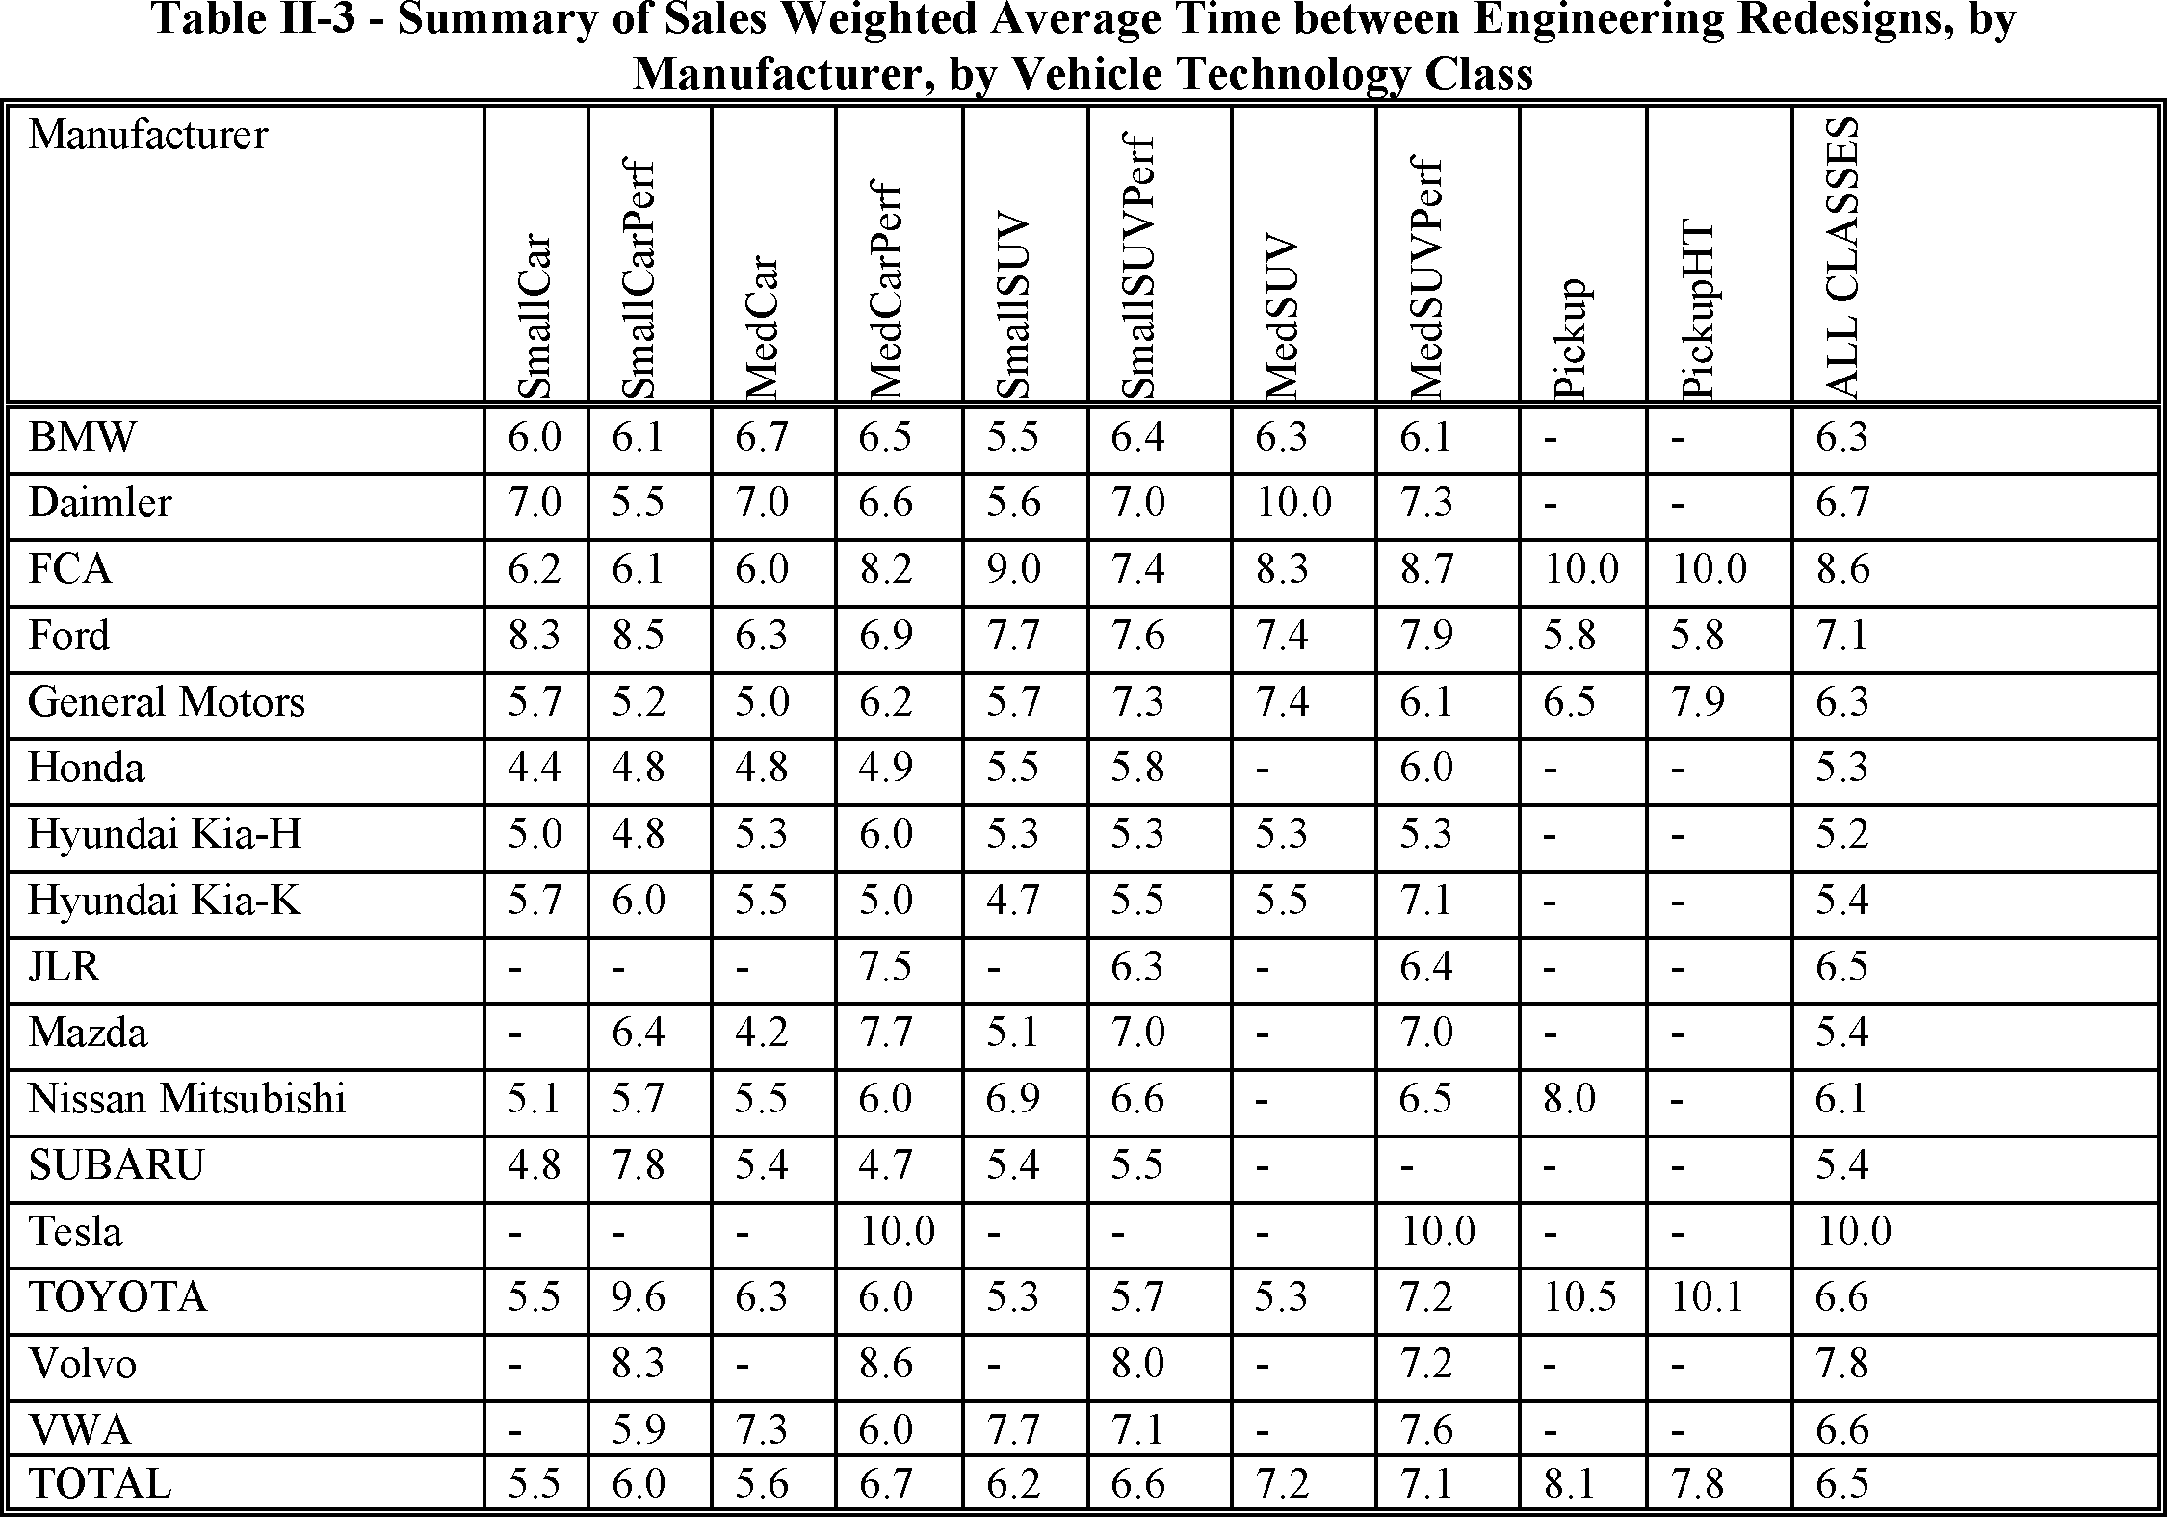 nissan battery diagram, nissan diesel conversion, nissan chassis diagram, nissan ignition key, nissan brakes diagram, nissan transaxle, nissan repair guide, nissan electrical diagrams, nissan radiator diagram, nissan fuel system diagram, nissan distributor diagram, nissan schematic diagram, nissan wire harness diagram, nissan repair diagrams, nissan engine diagram, nissan main fuse, nissan ignition resistor, nissan fuel pump, nissan suspension diagram, nissan body diagram, on nissan va te wiring diagram